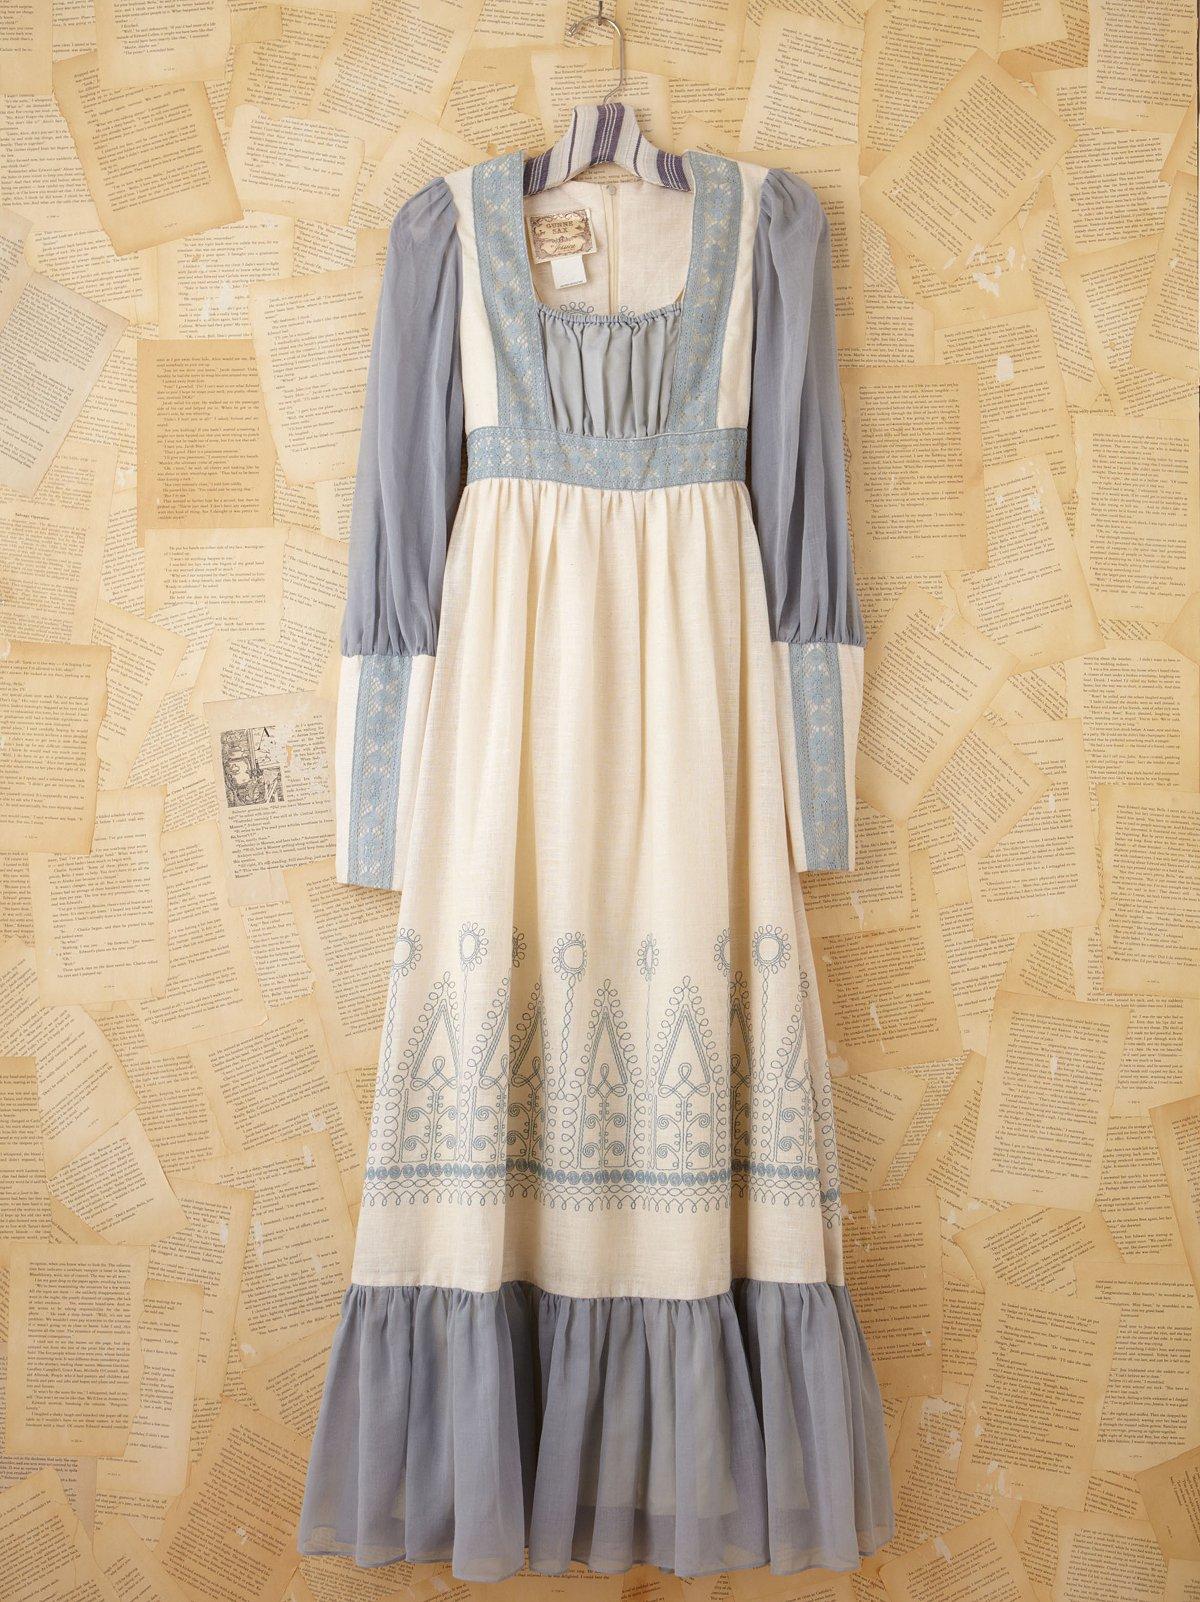 Vintage Blue and White Gunne Sax Dress